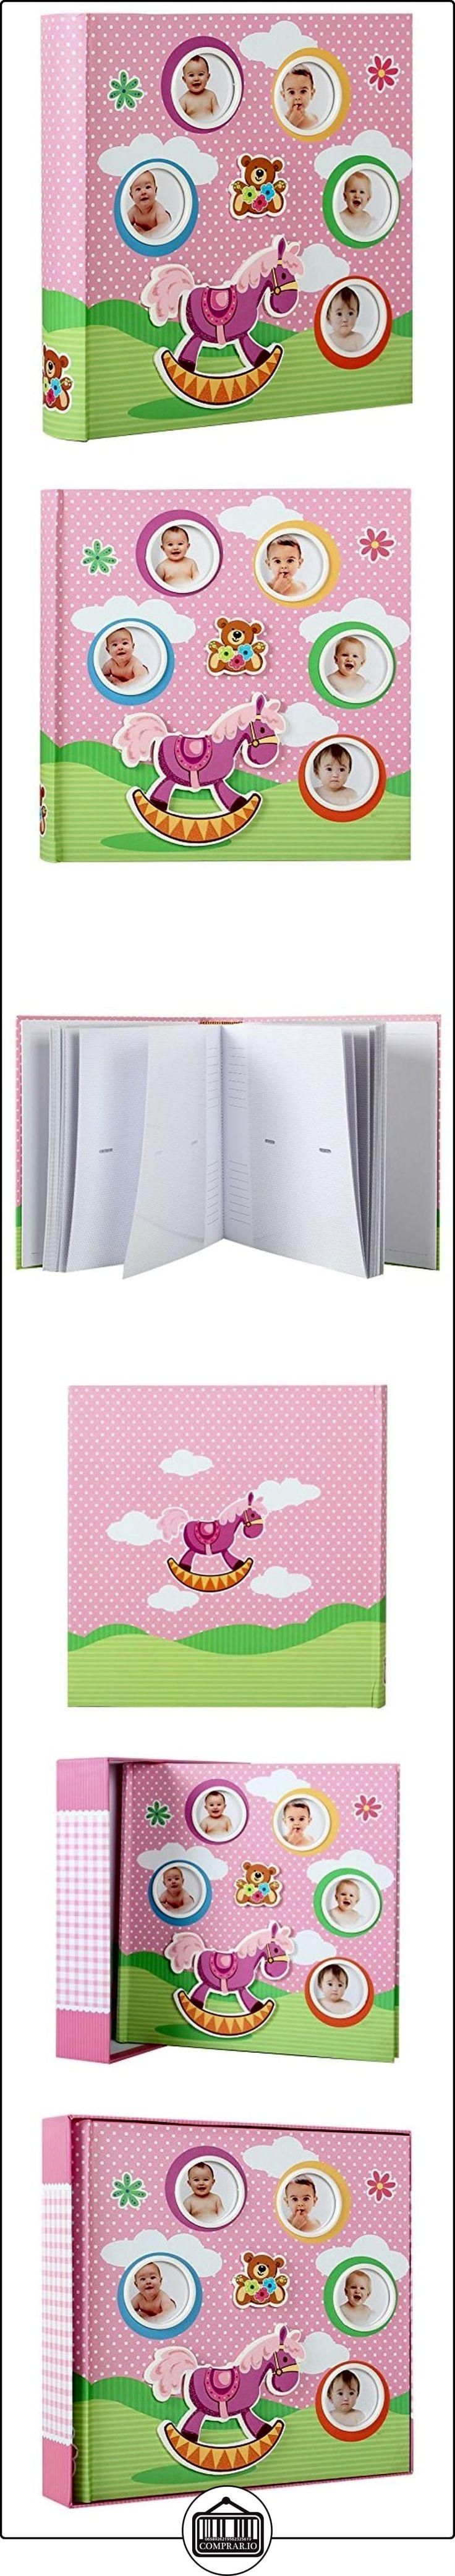 Coffret álbum de fotos de nacimiento caballo rosa para 200fotos 10x 15cm  ✿ Regalos para recién nacidos - Bebes ✿ ▬► Ver oferta: http://comprar.io/goto/B01AAUKHCU